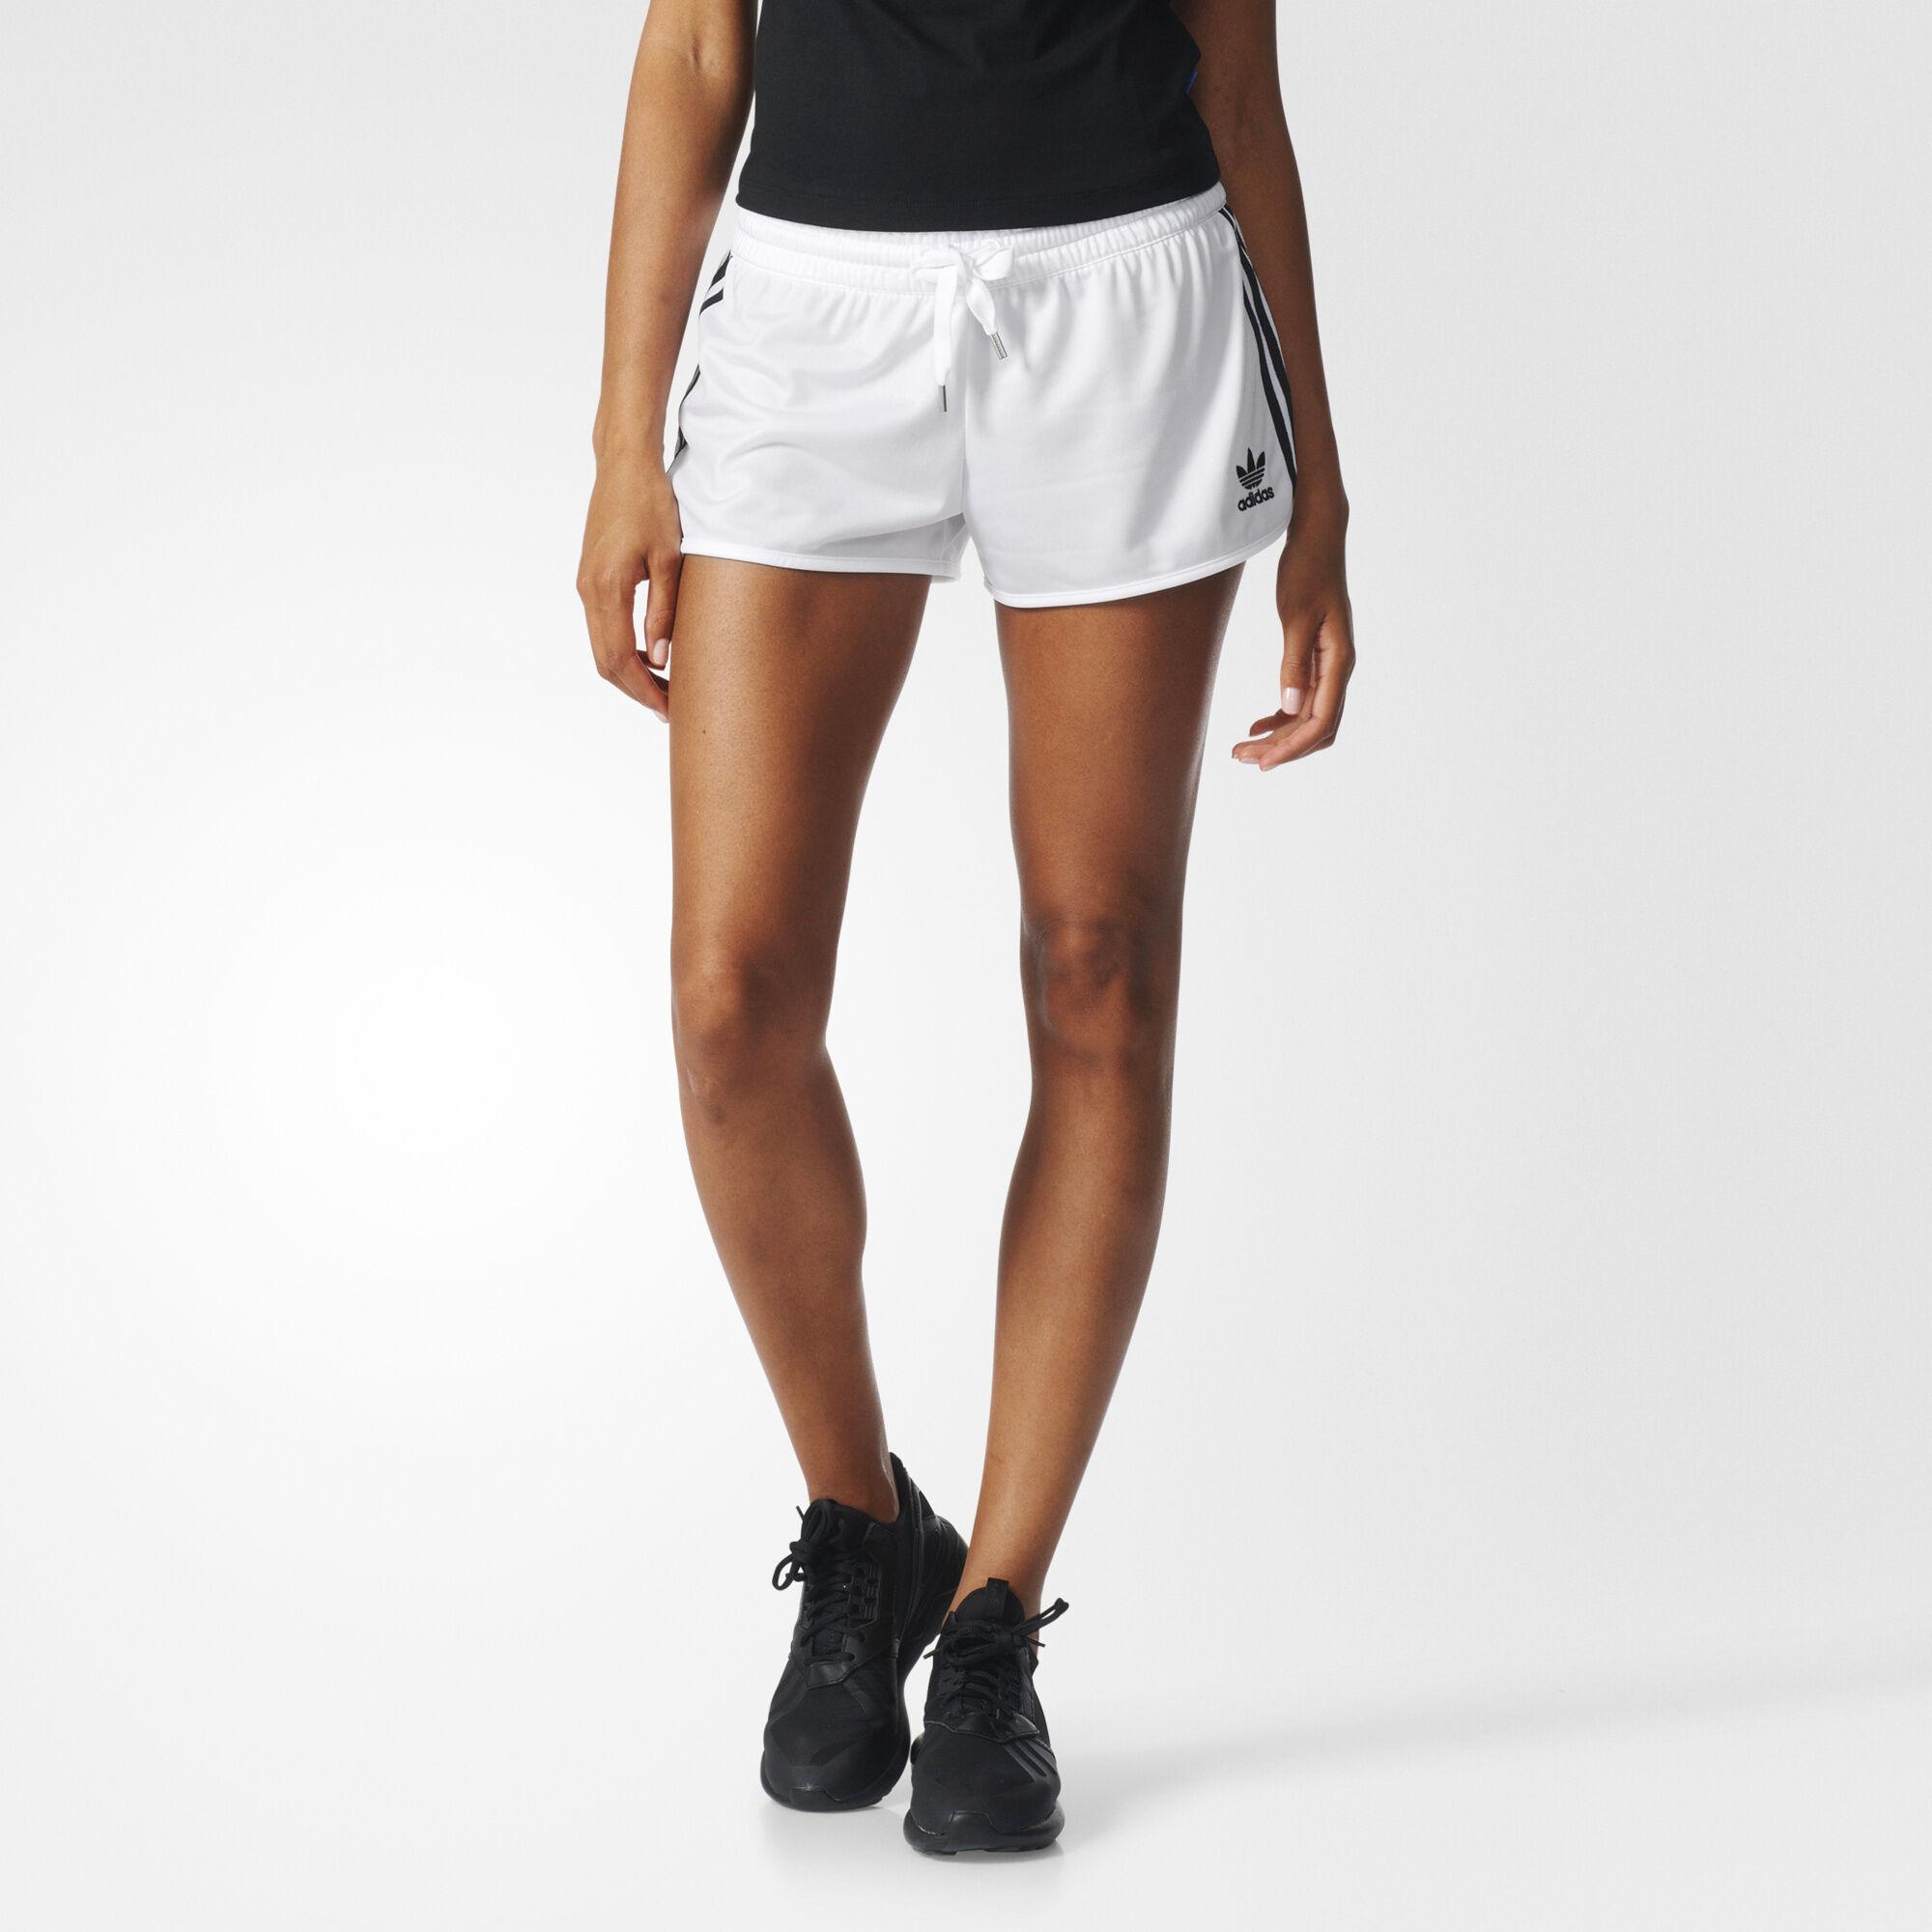 adidas pantaloncini donna